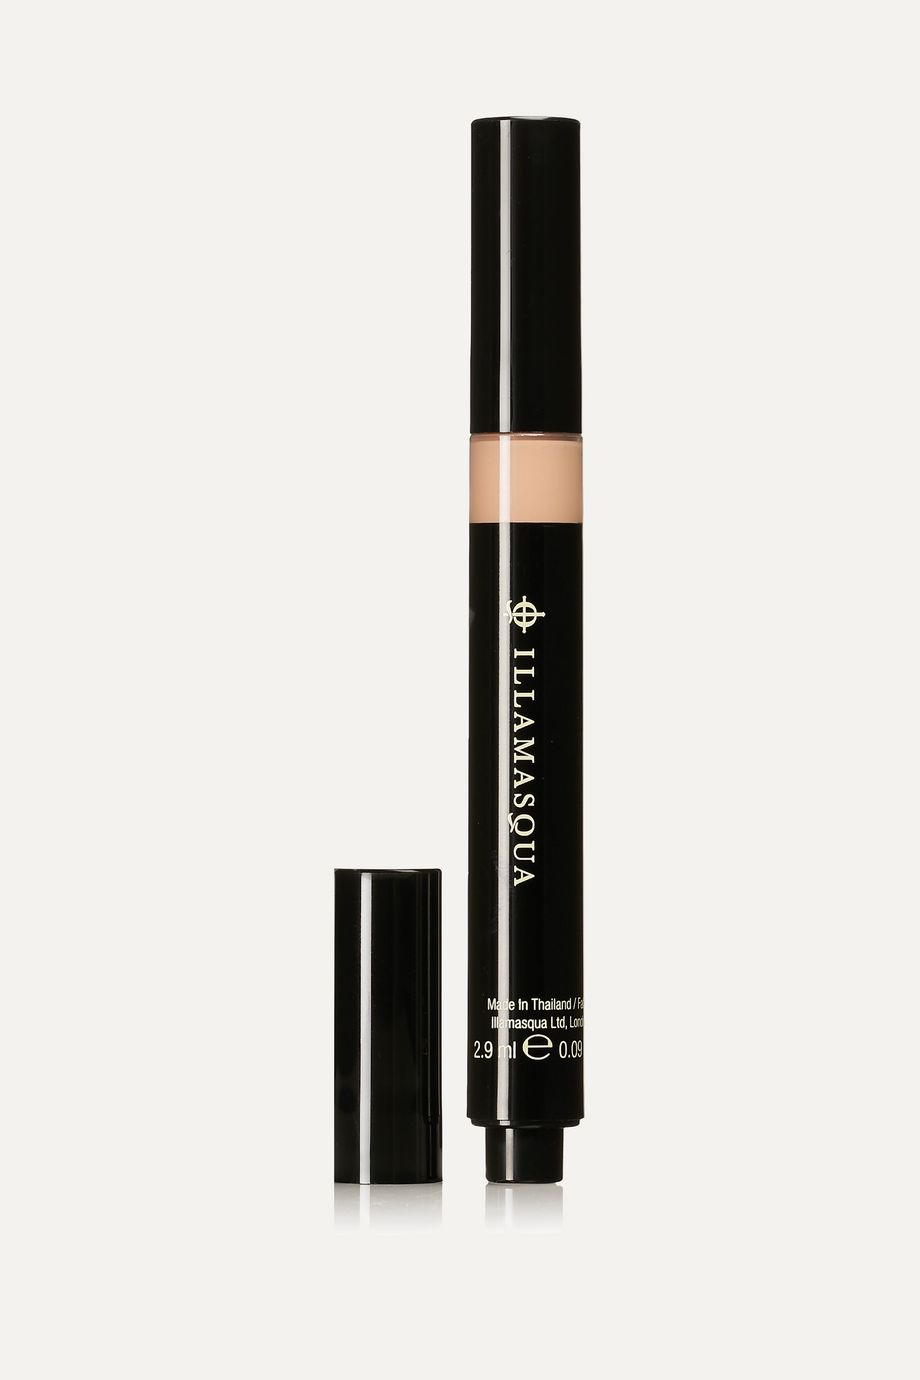 Illamasqua Skin Base Concealer Pen - Medium 1